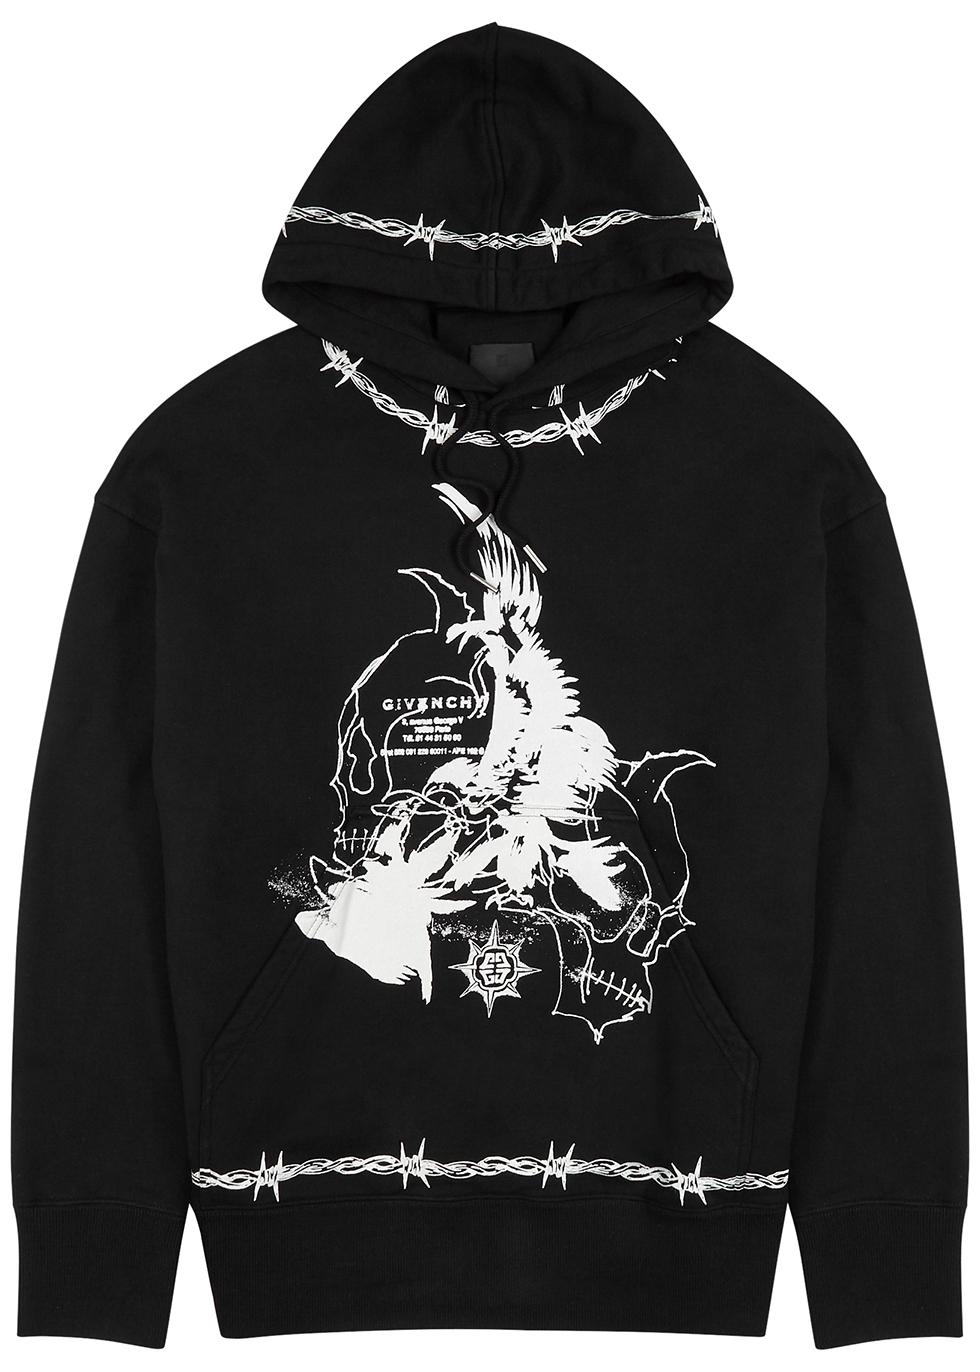 Black printed hooded cotton sweatshirt